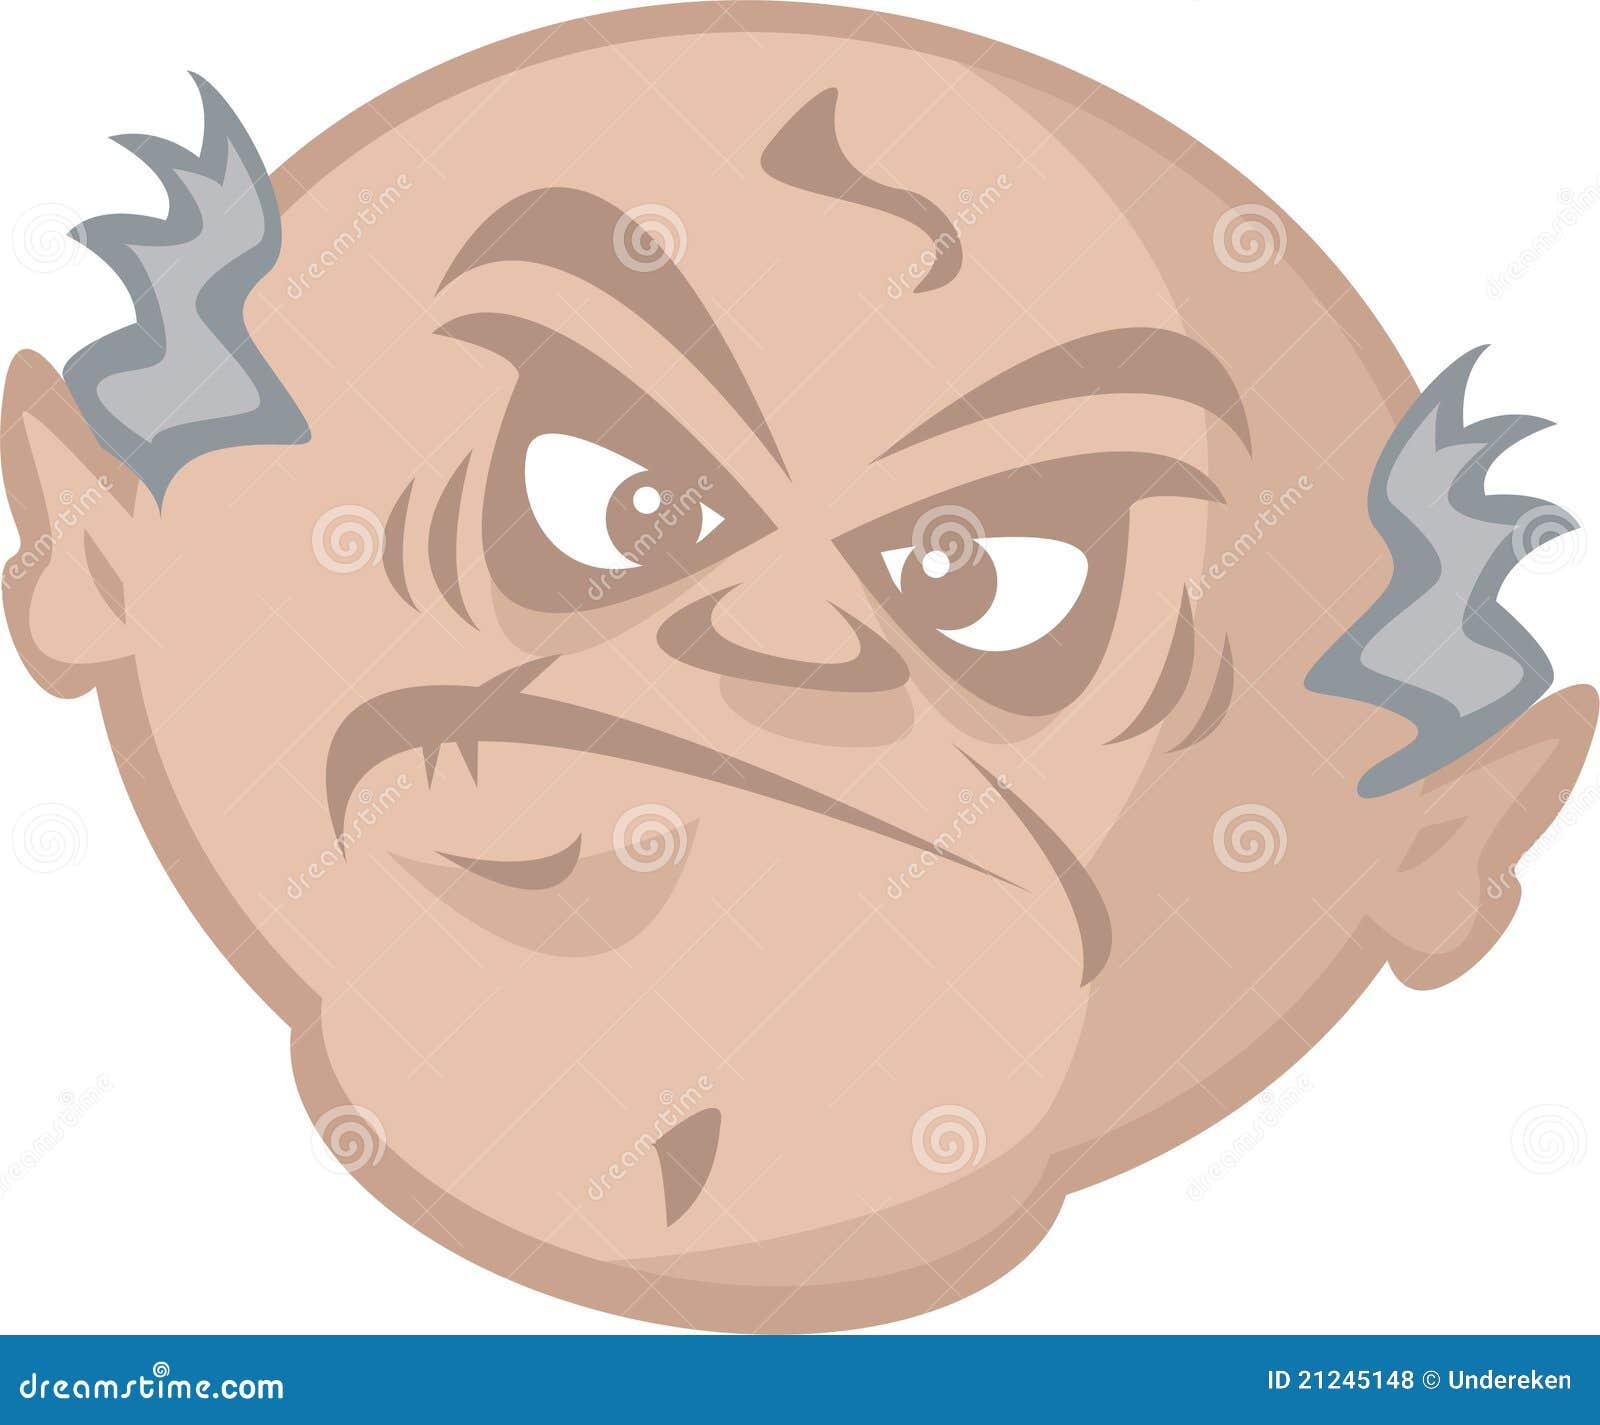 Grumpy Cartoon Face Grumpy old manGrumpy Old Man Cartoon Face